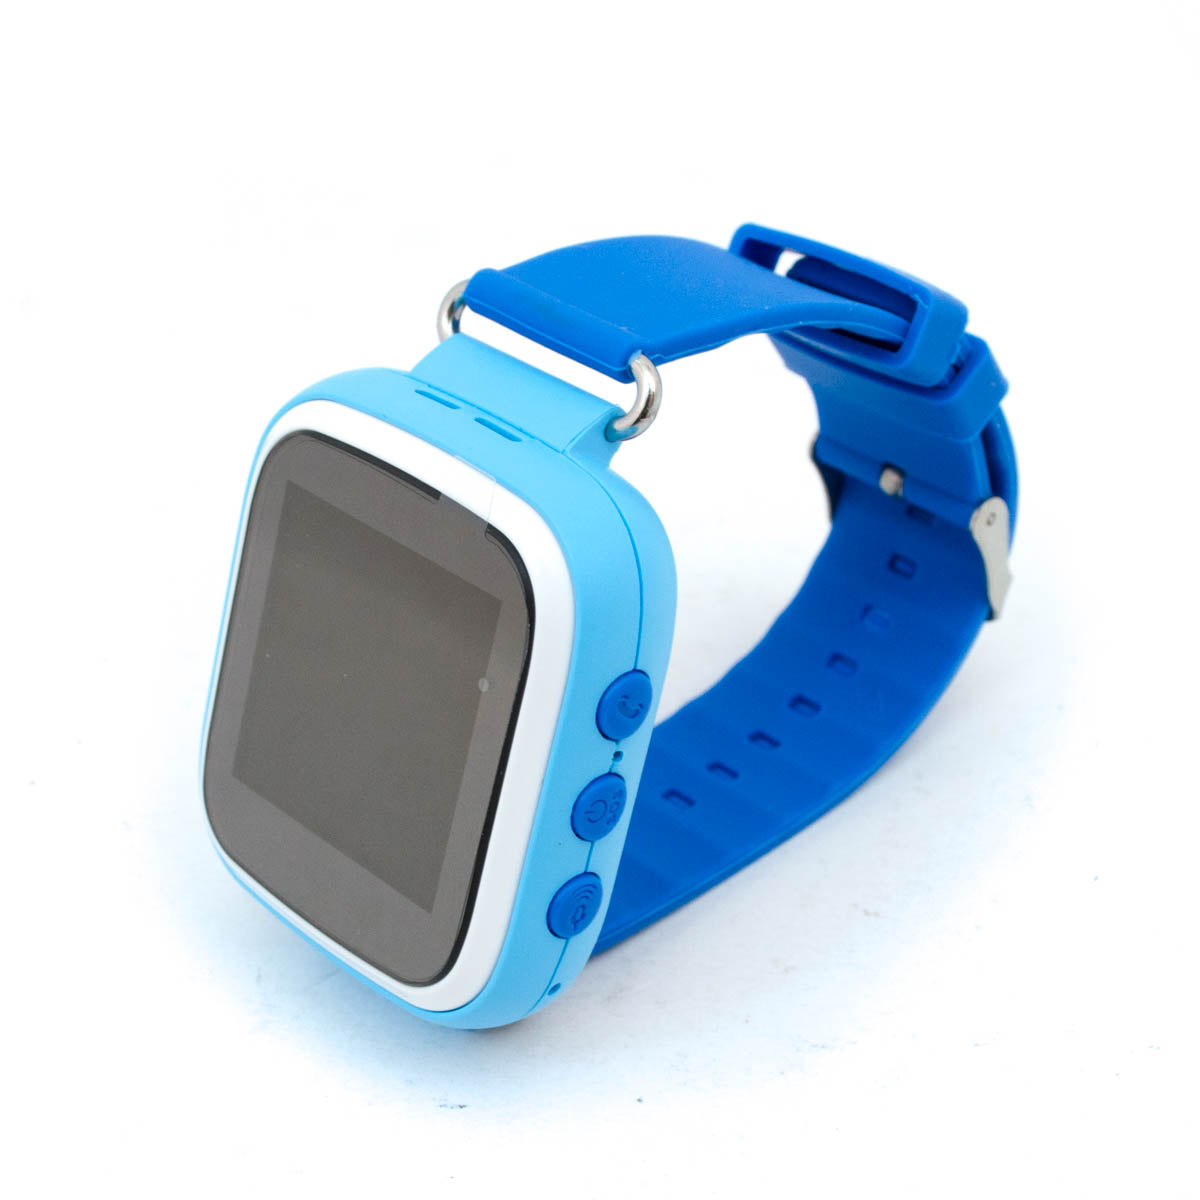 Дитячий годинник Smart Baby Watch Q60. Опис 8c7bc78fa949d